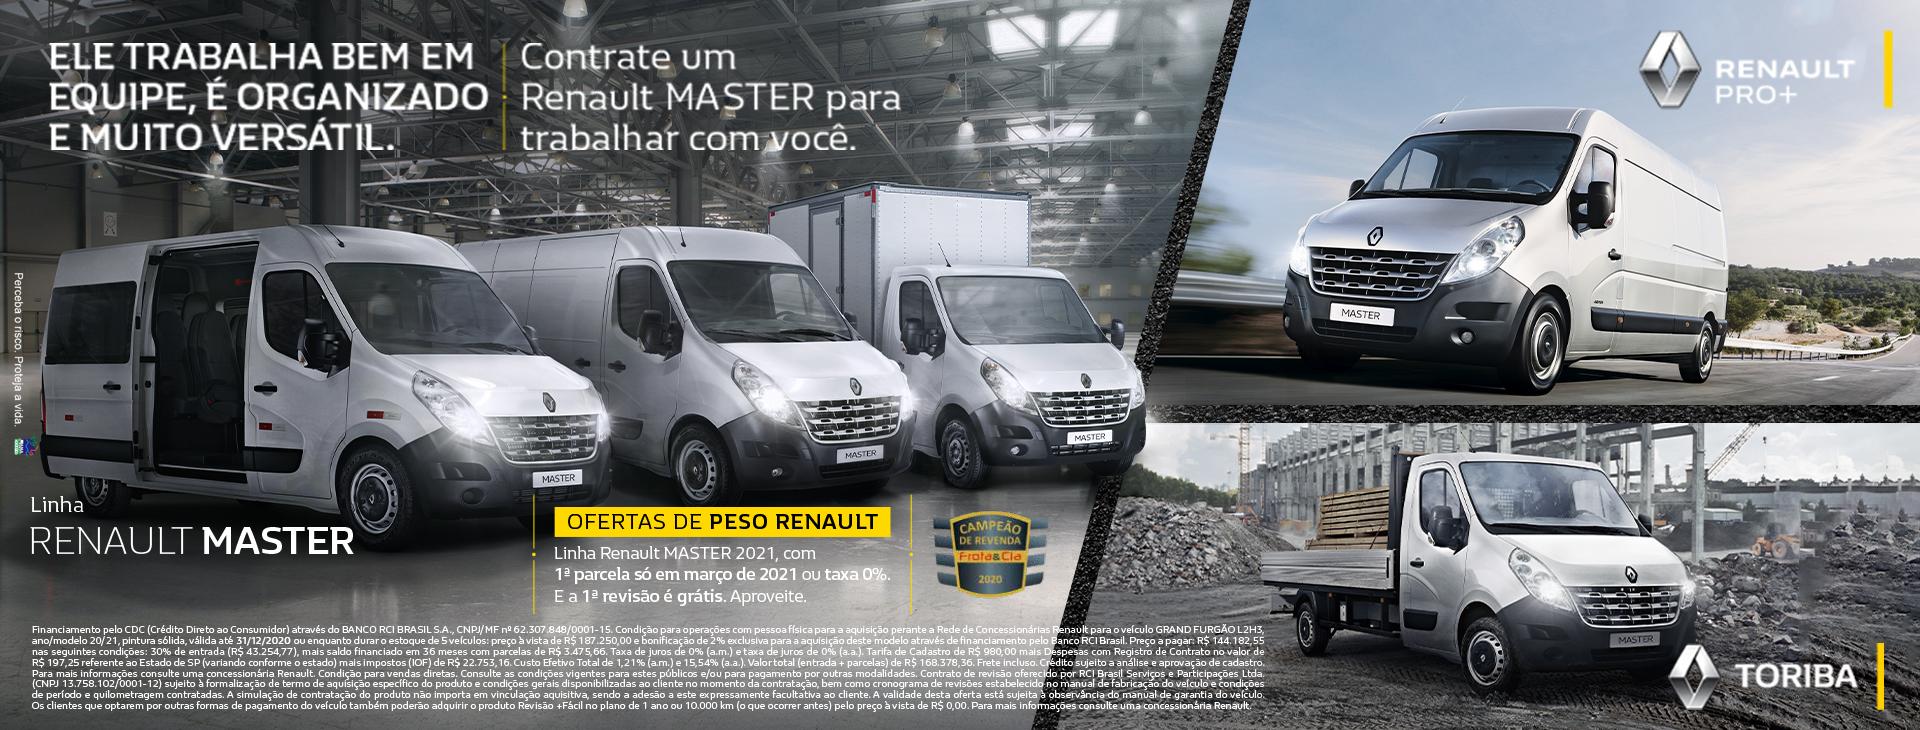 Toriba Renault